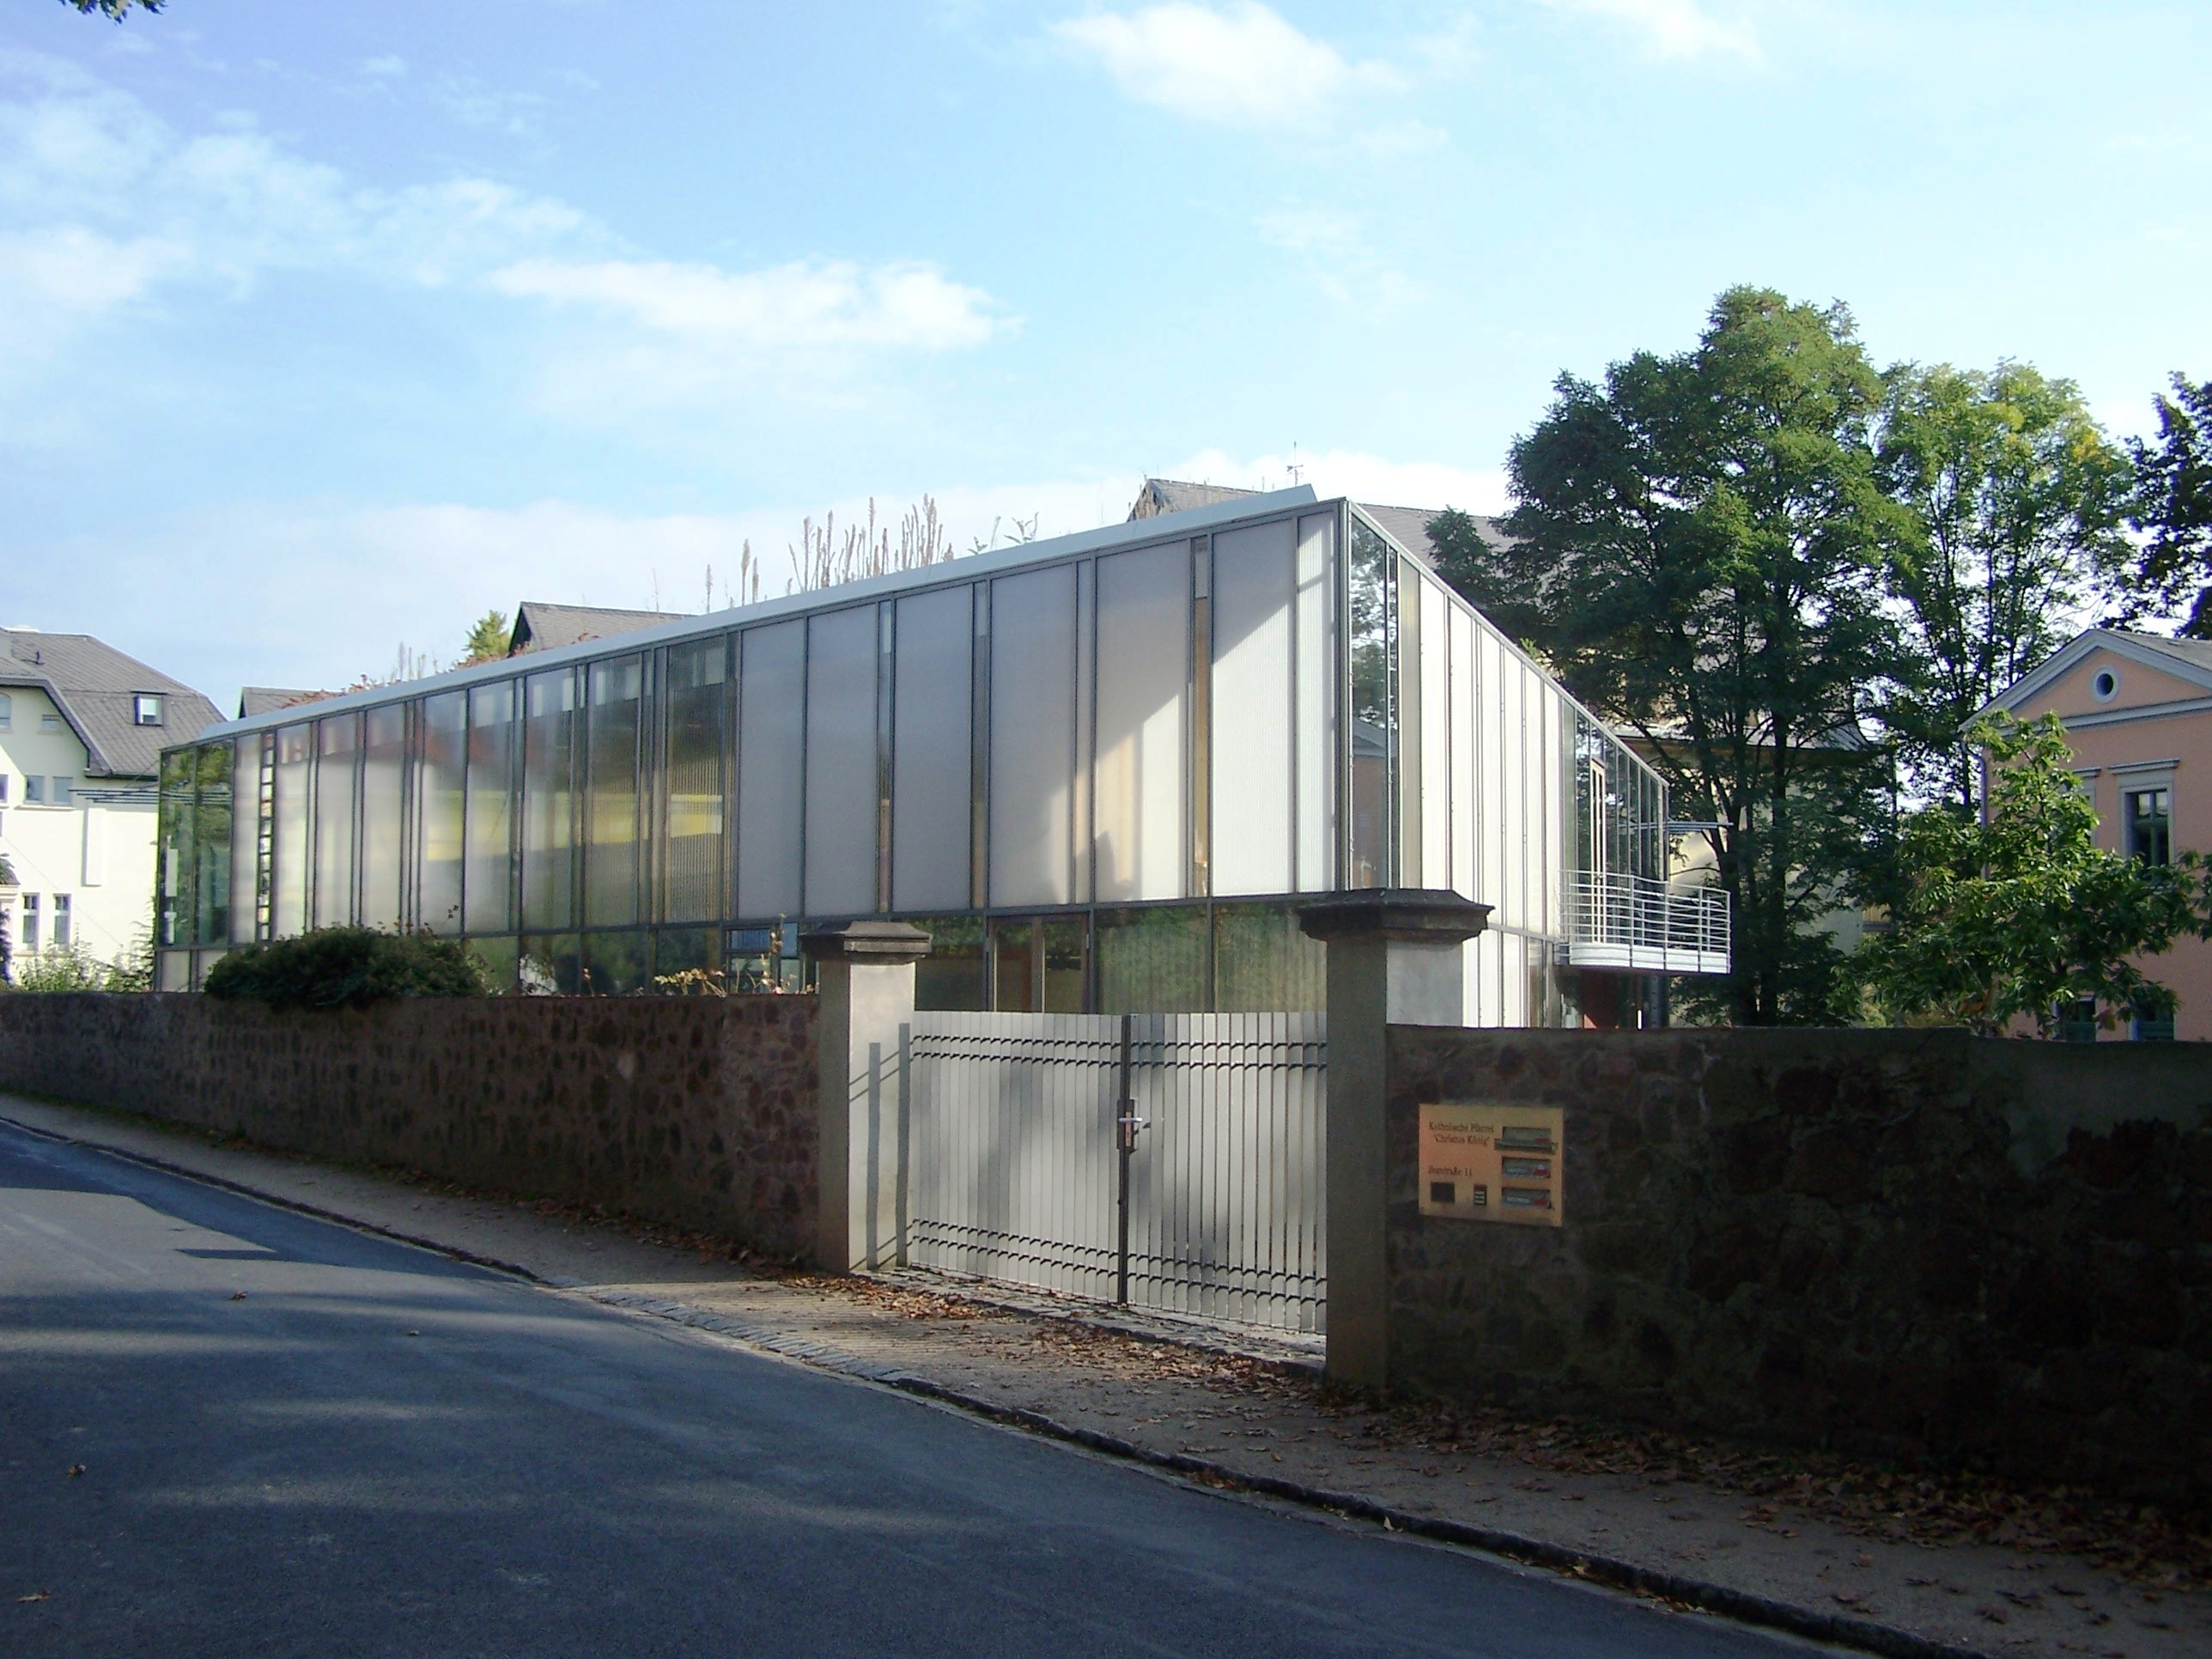 Architekt Radebeul file radebeul christkönig jpg wikimedia commons